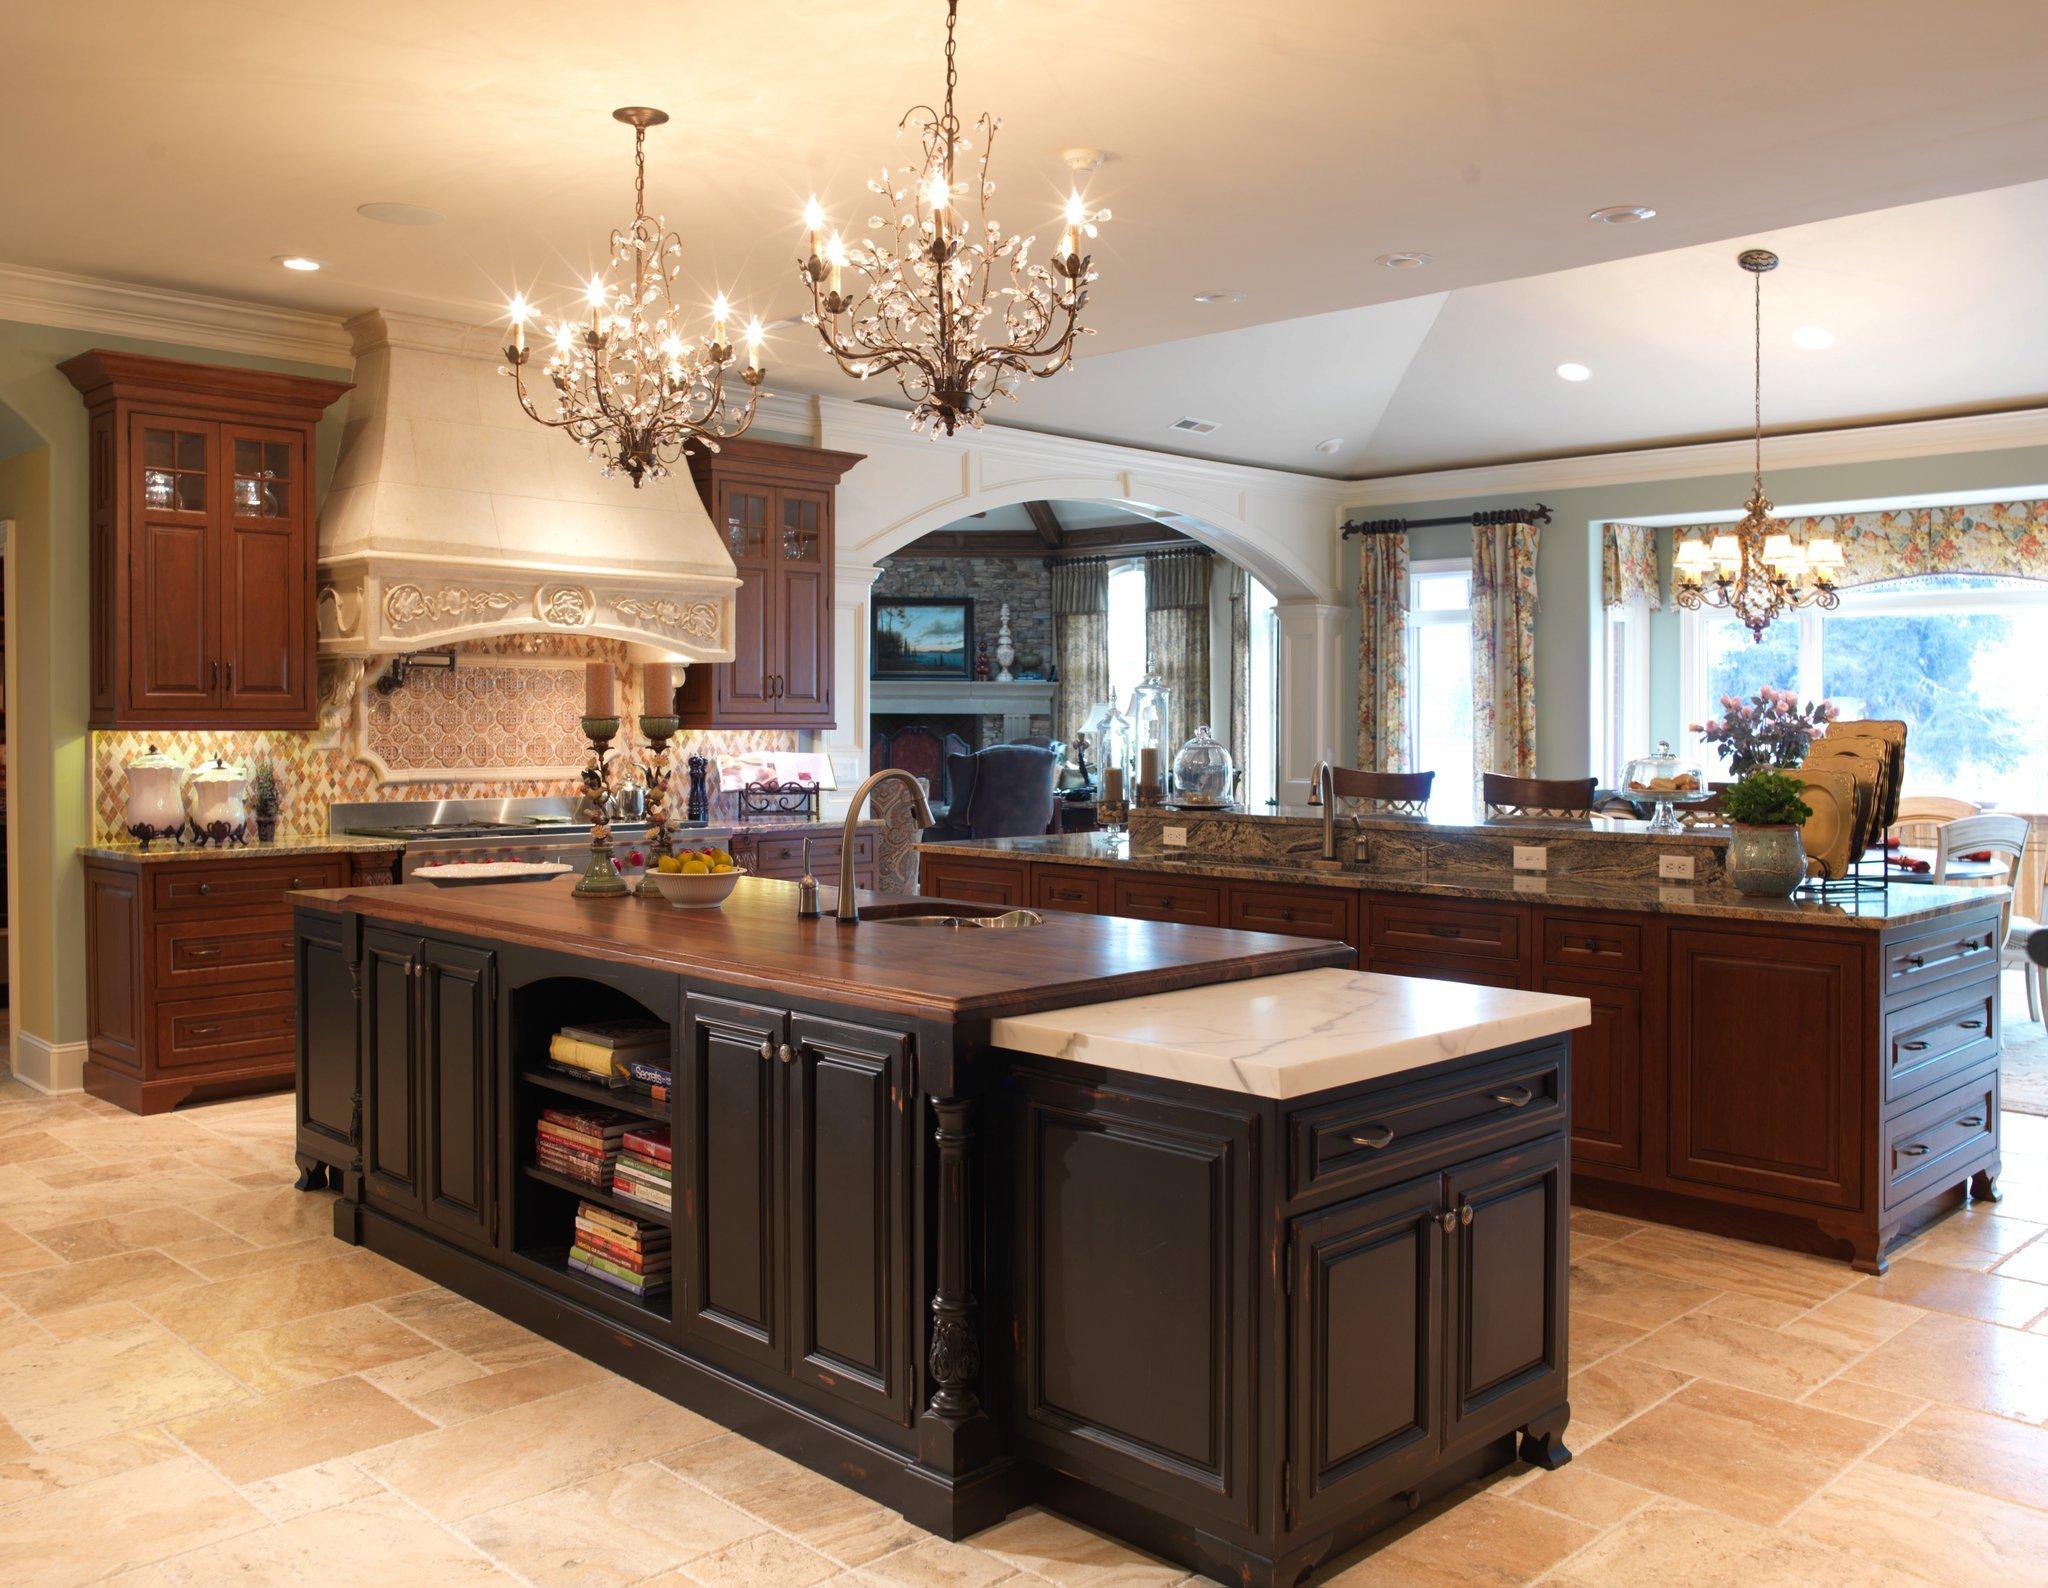 Custom Kitchen Cabinets in Chattanooga, TN | Scarlett's ...